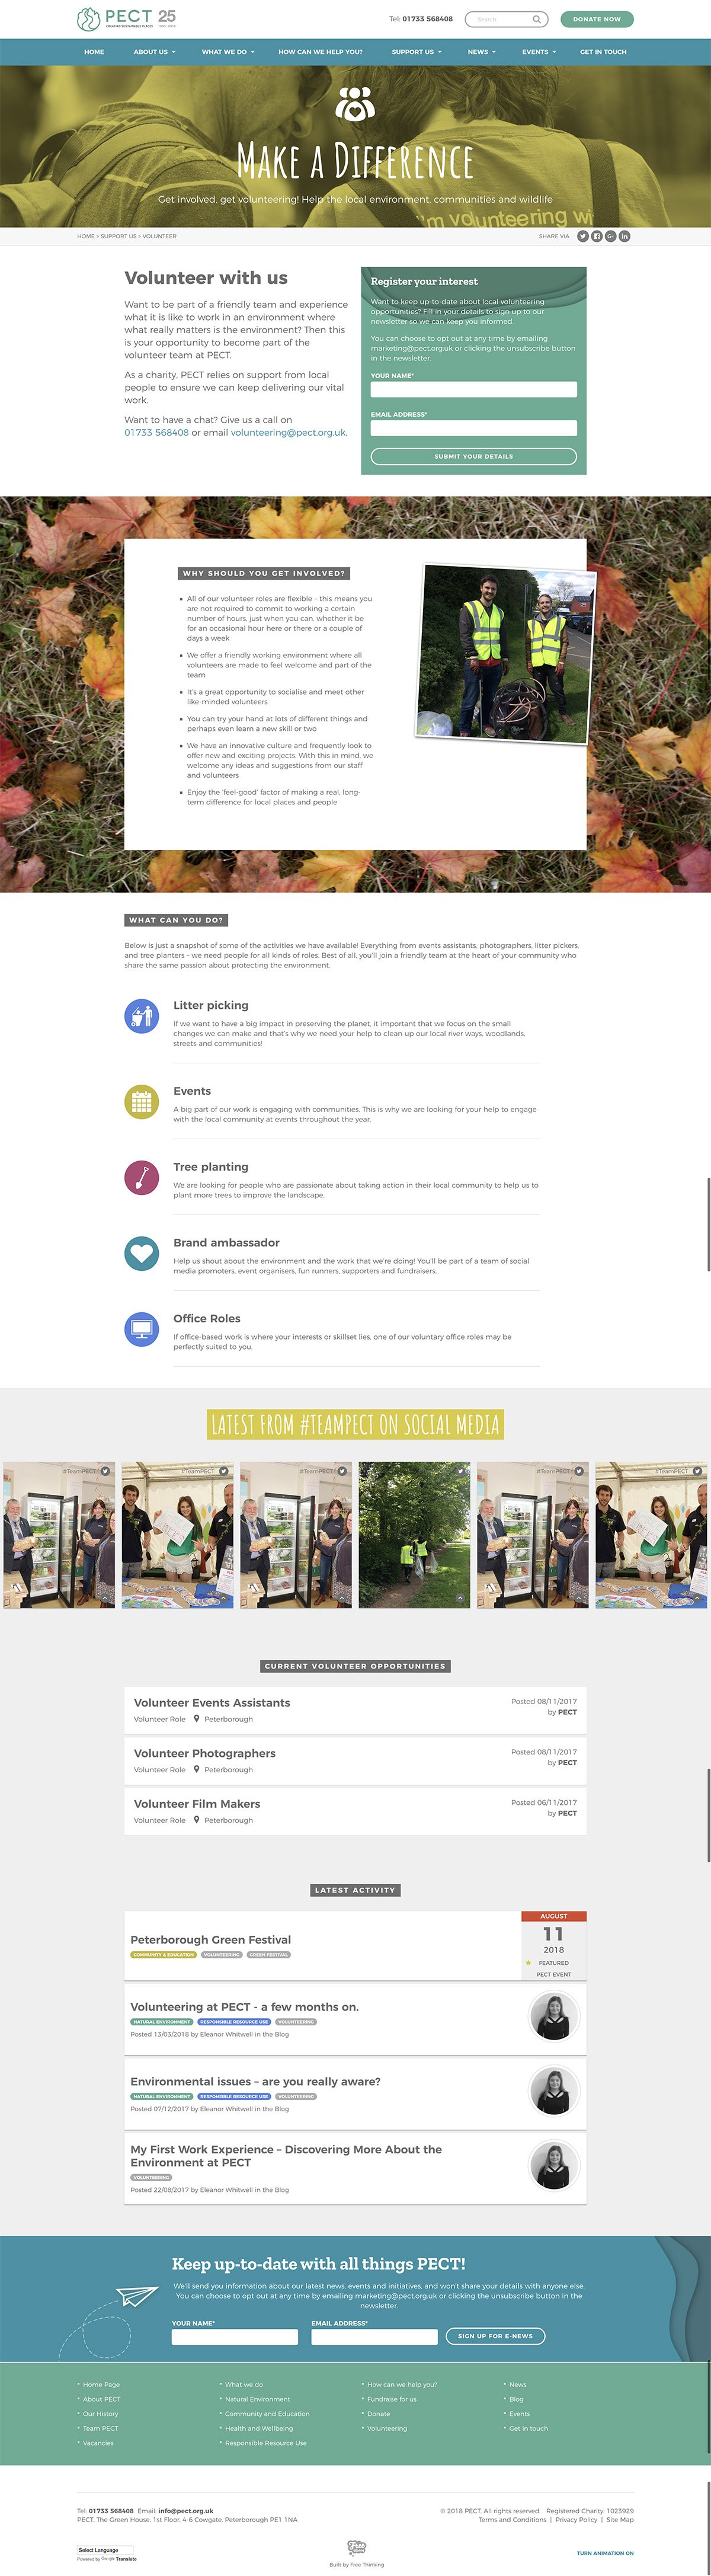 PECT Volunteer Page Screenshot